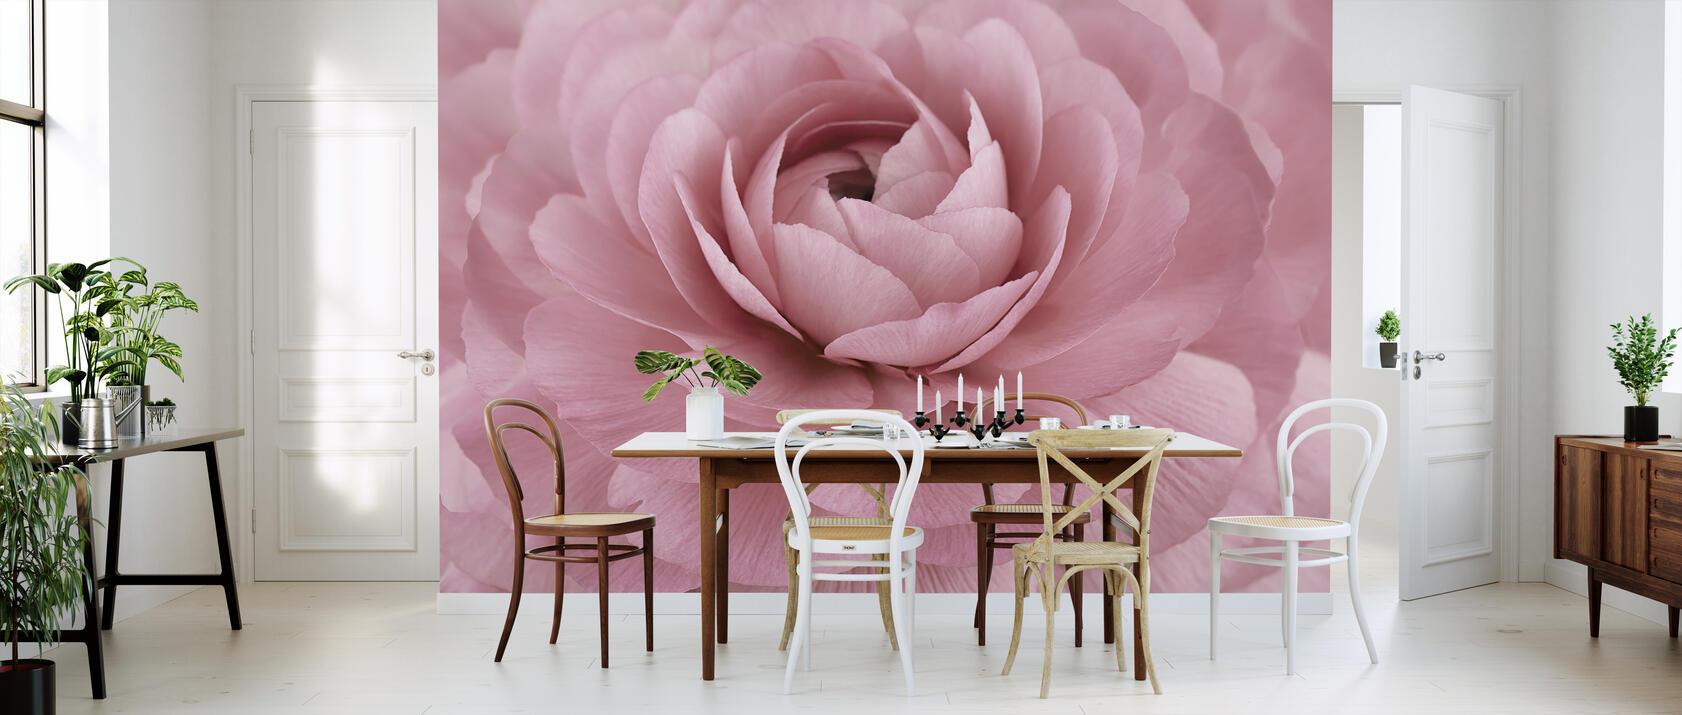 pink buttercup fototapete nach ma photowall. Black Bedroom Furniture Sets. Home Design Ideas